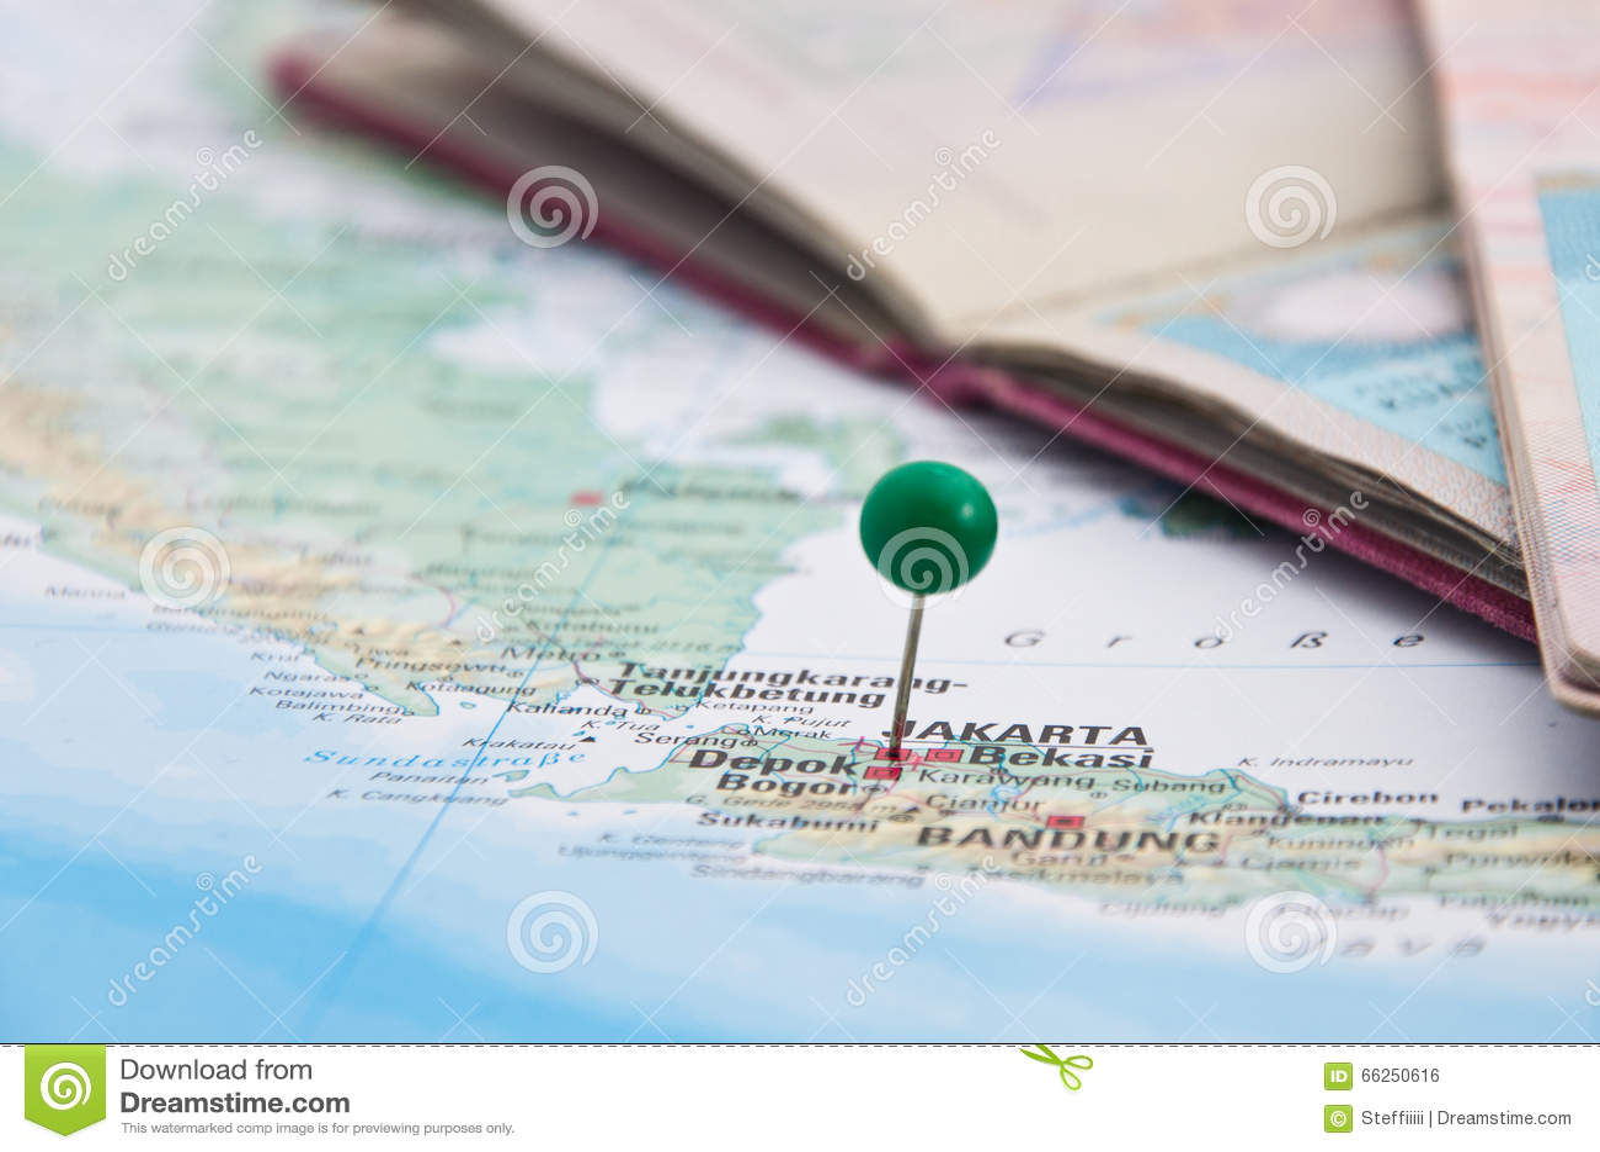 Jakarta, Java, Indonesia, GreenPin And Passport, Close-Up Of Map ...